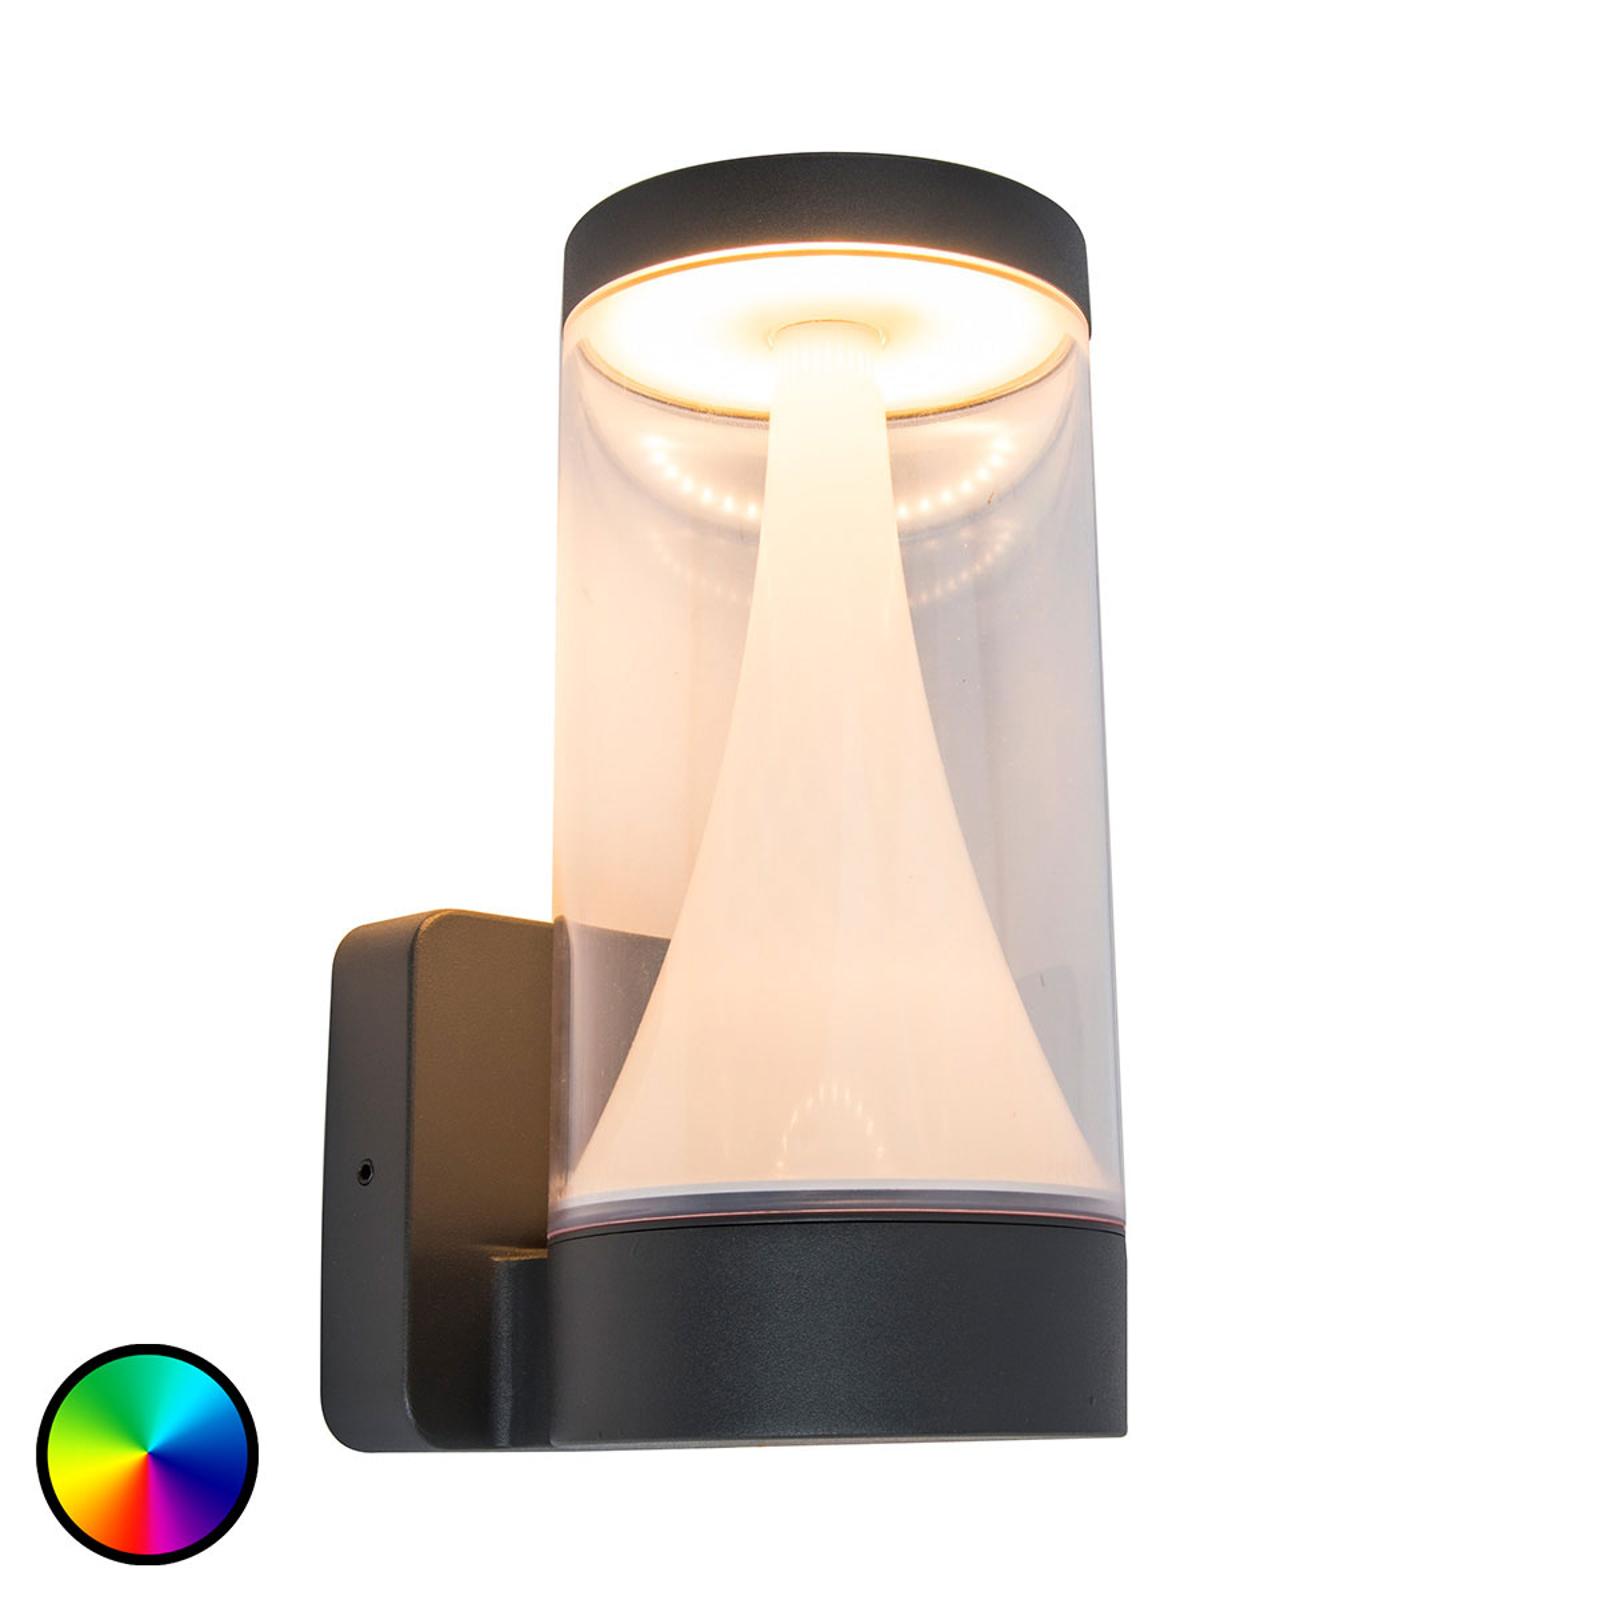 WiZ LED-utomhusvägglampa Spica